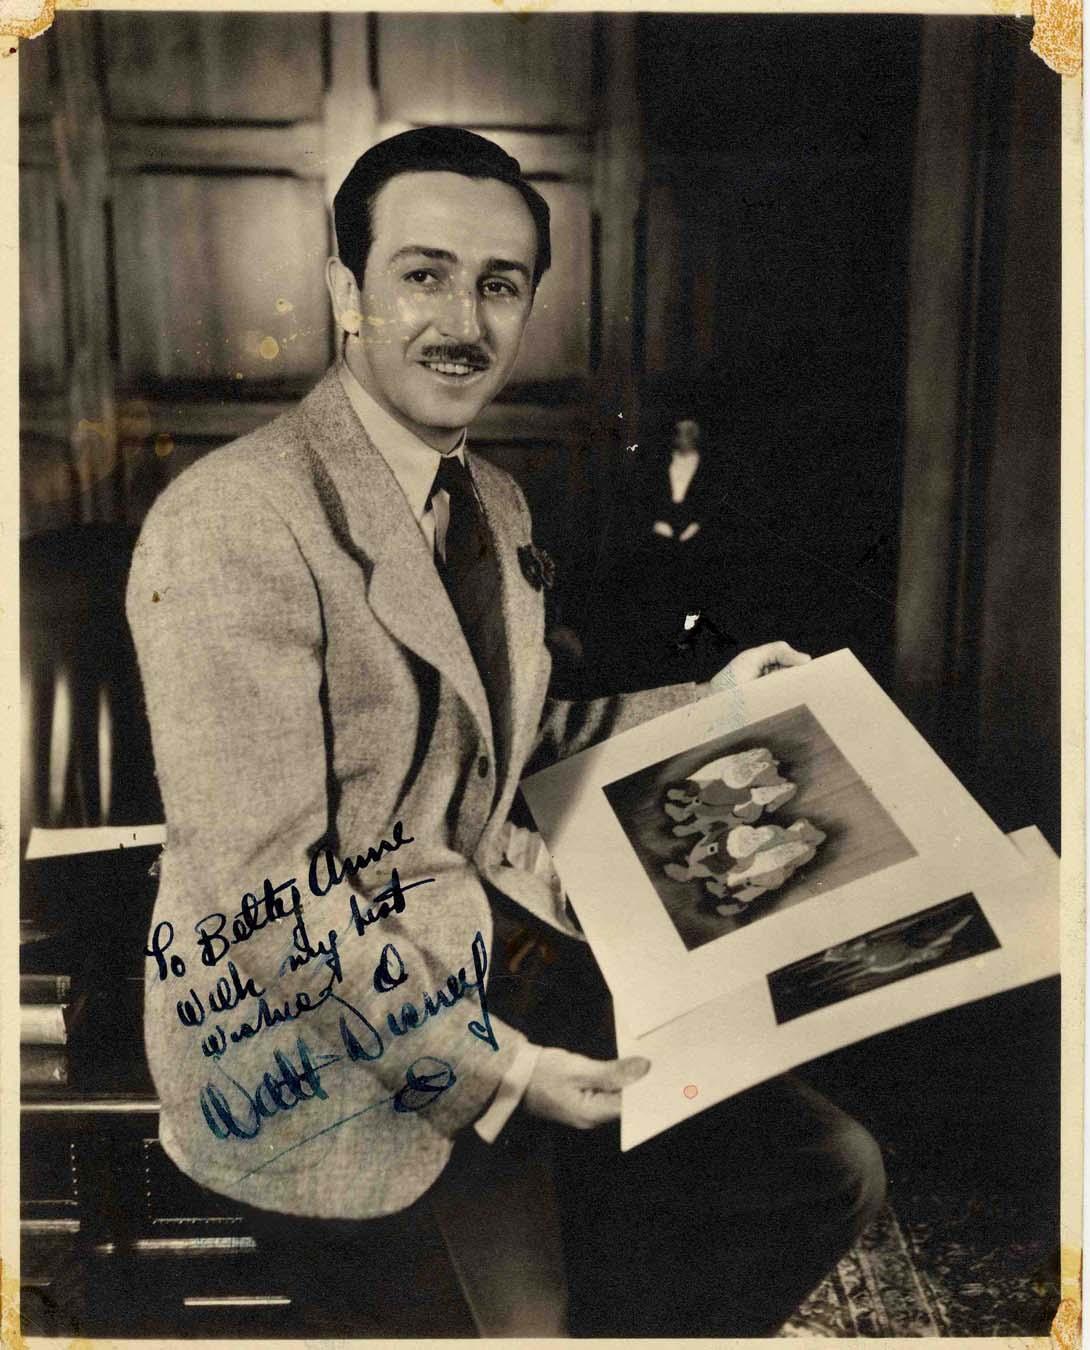 "Walt Disney Autograph Scarce Vintage Walt Disney 8"" x 10"" Matte-Finish Signed and Inscribed Photo"